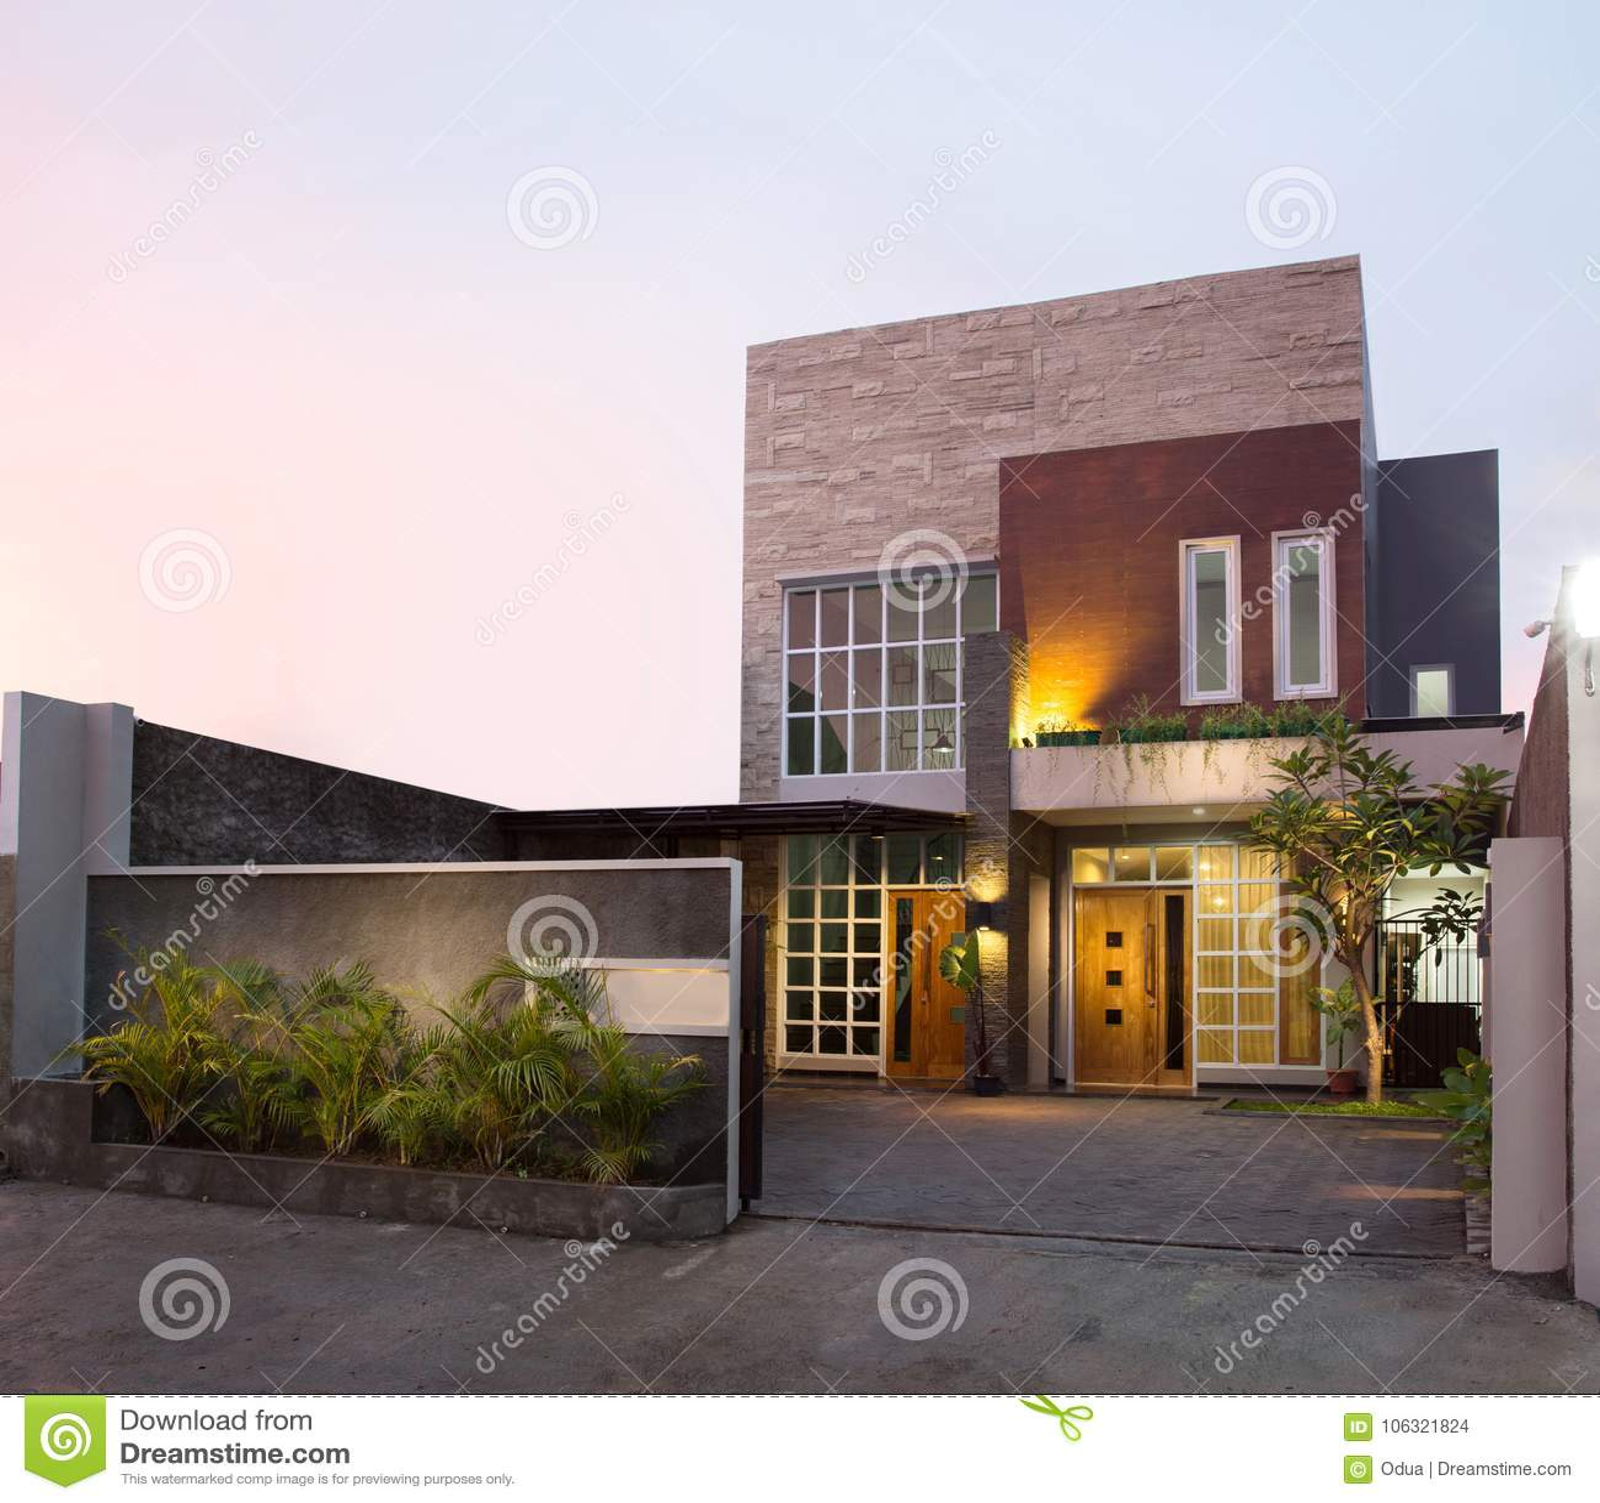 Contemporary Tropical House Tanga House: Modern Tropical House Stock Photo. Image Of Door, Estate